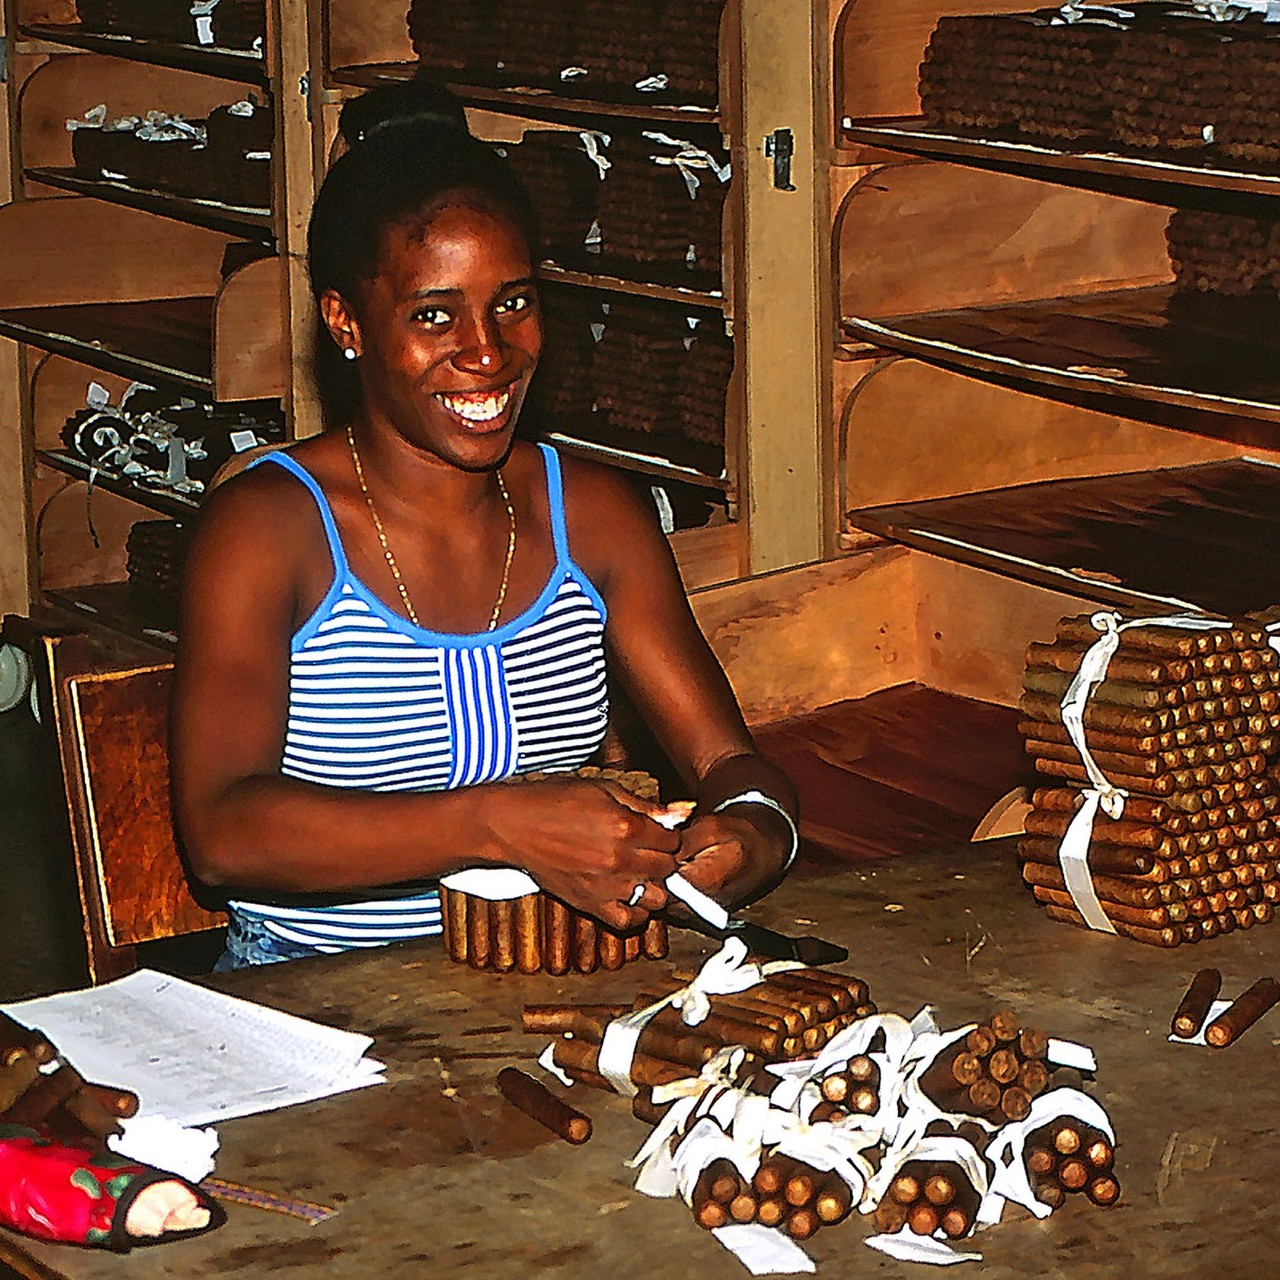 Cohiba Zigarrenfabrik Havanna/Kuba, 2000